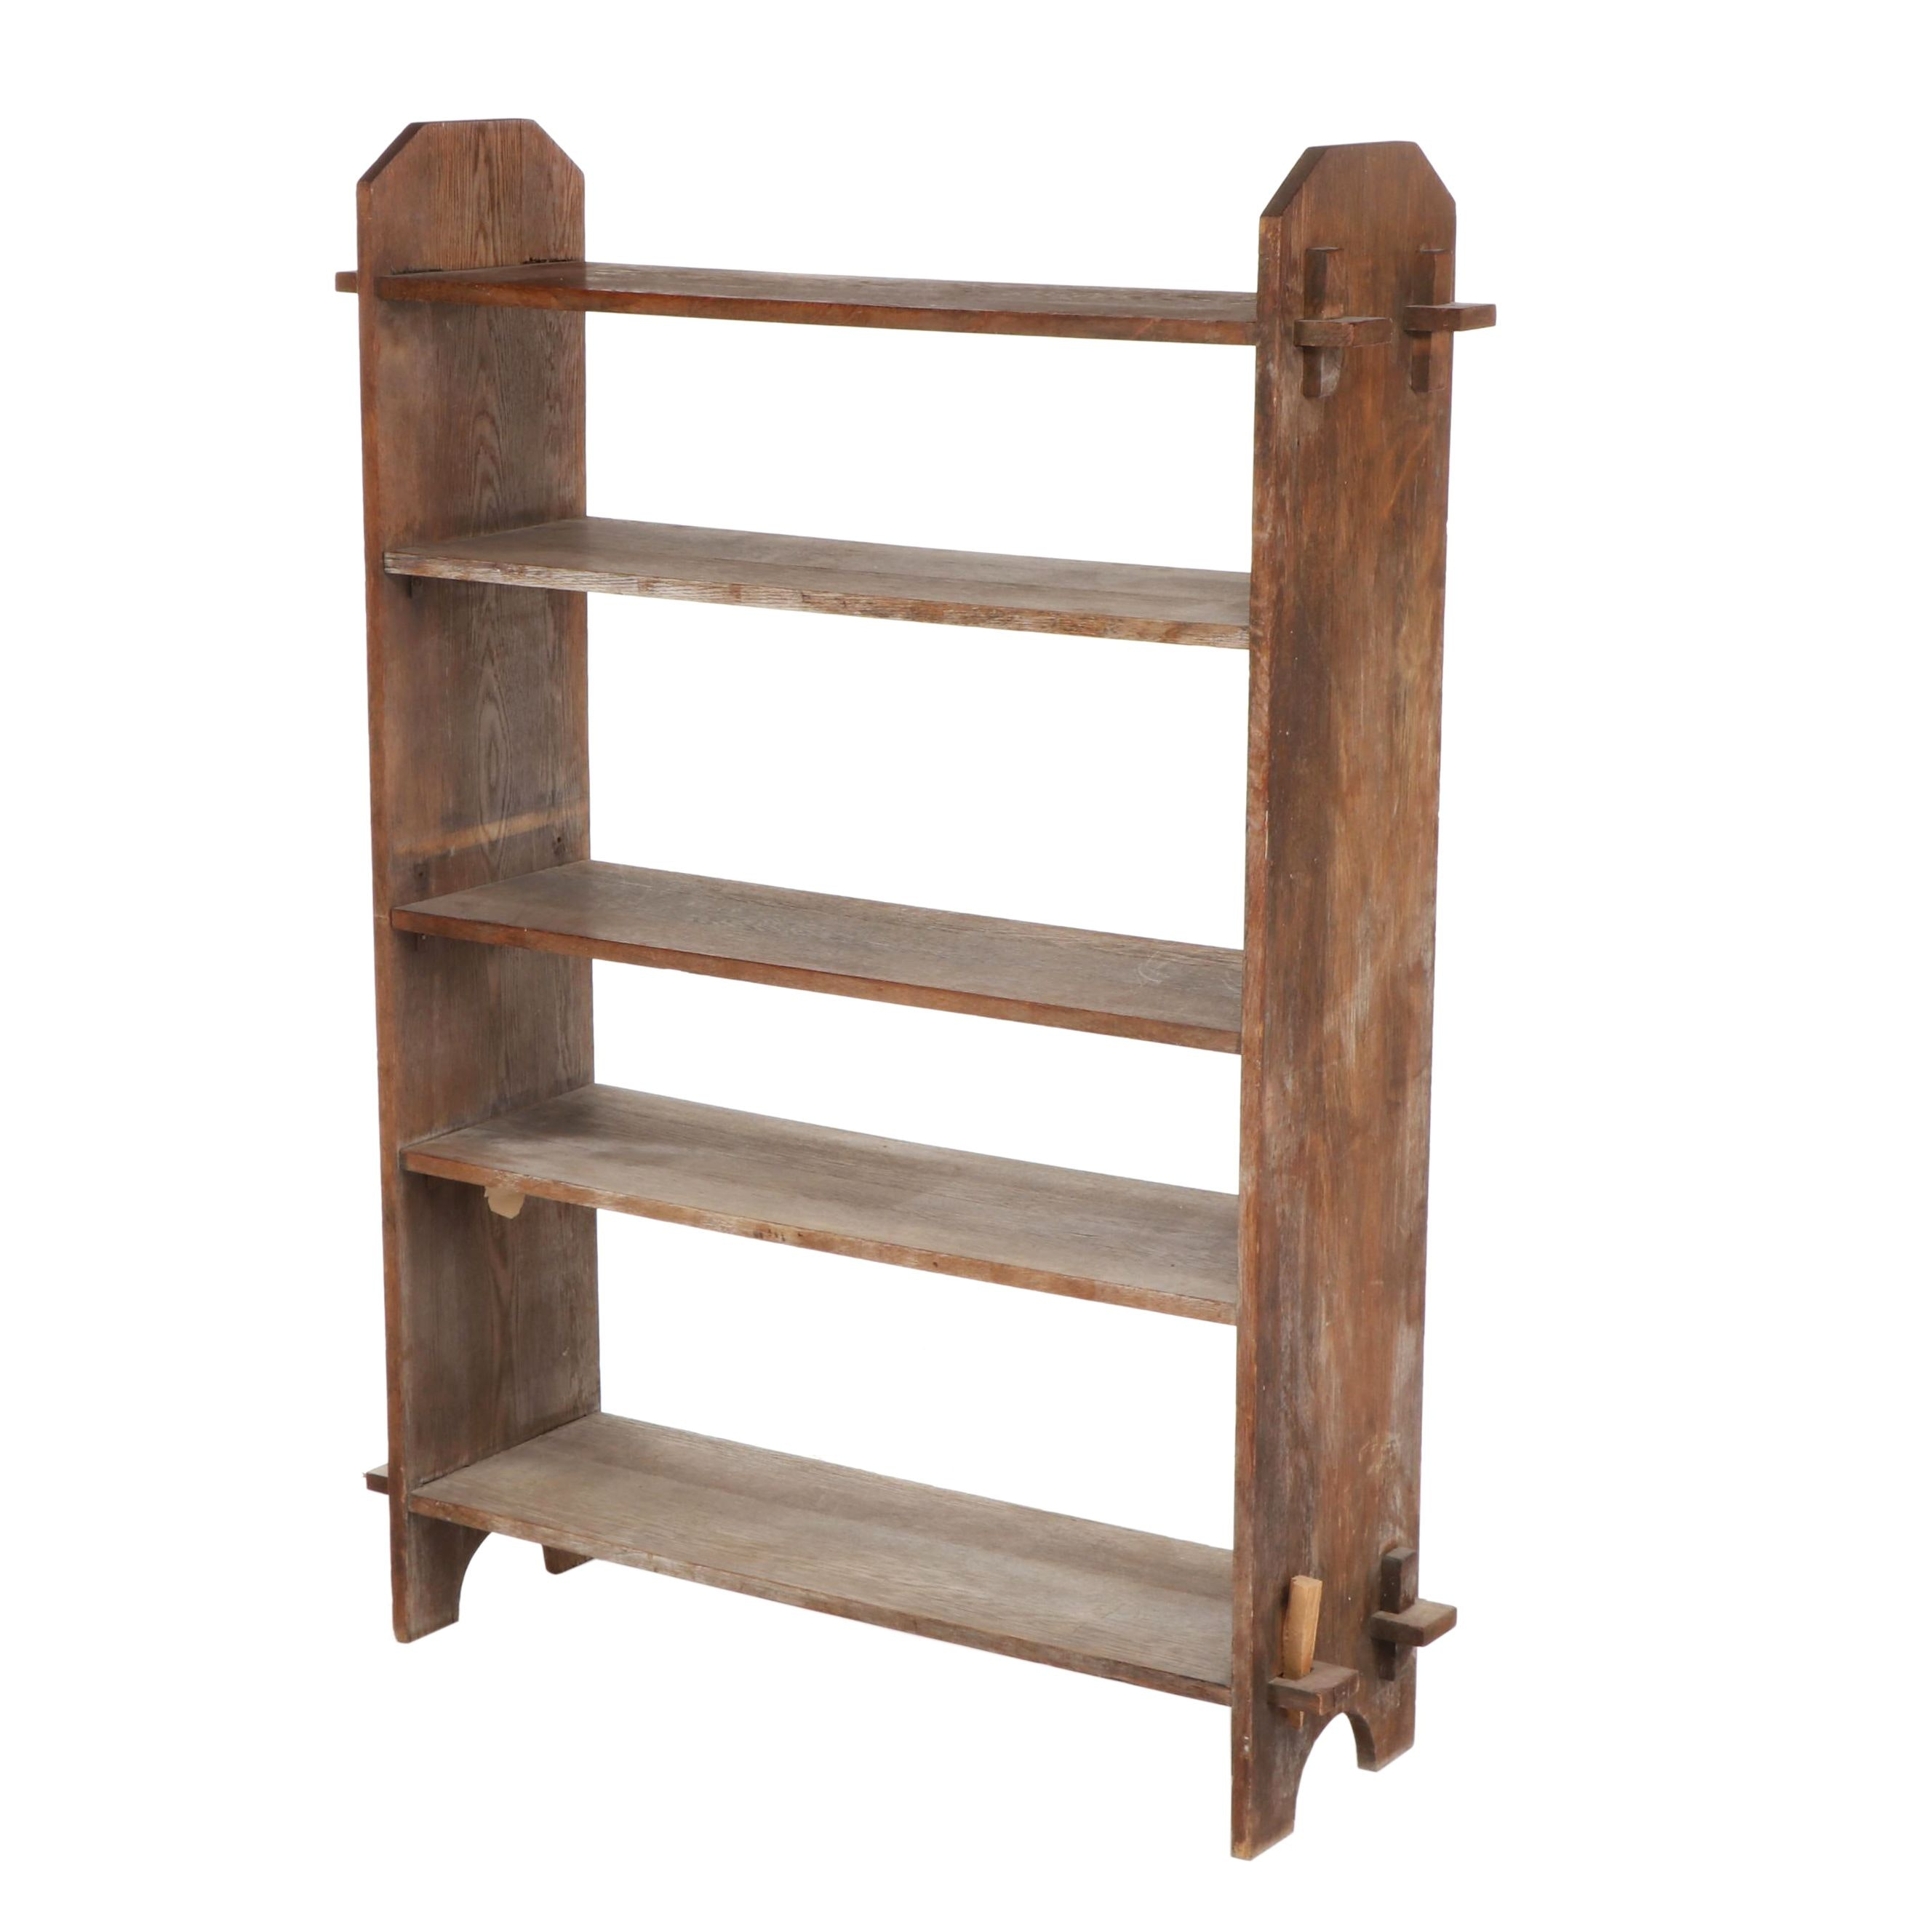 Contemporary Rustic East Asian Wooden Open Bookshelf